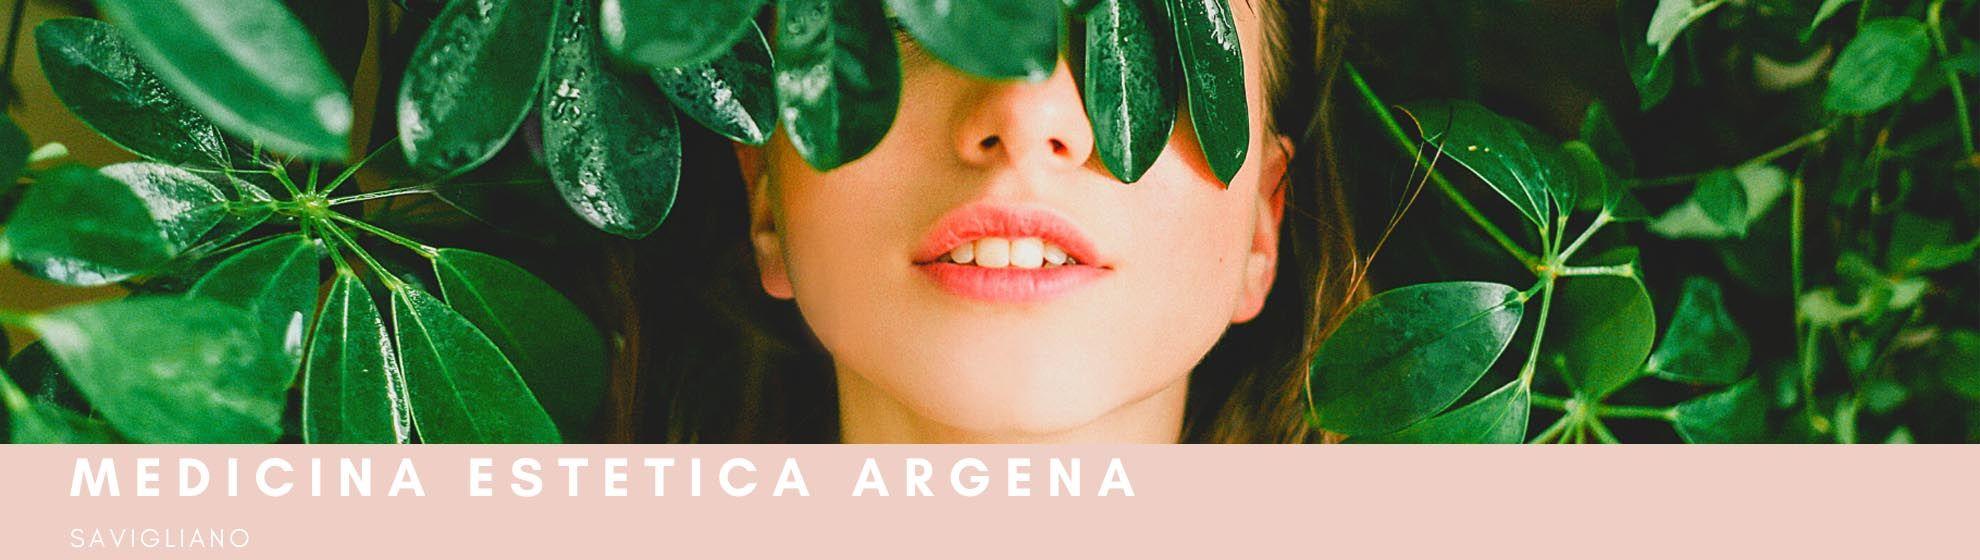 Dott.ri Argena